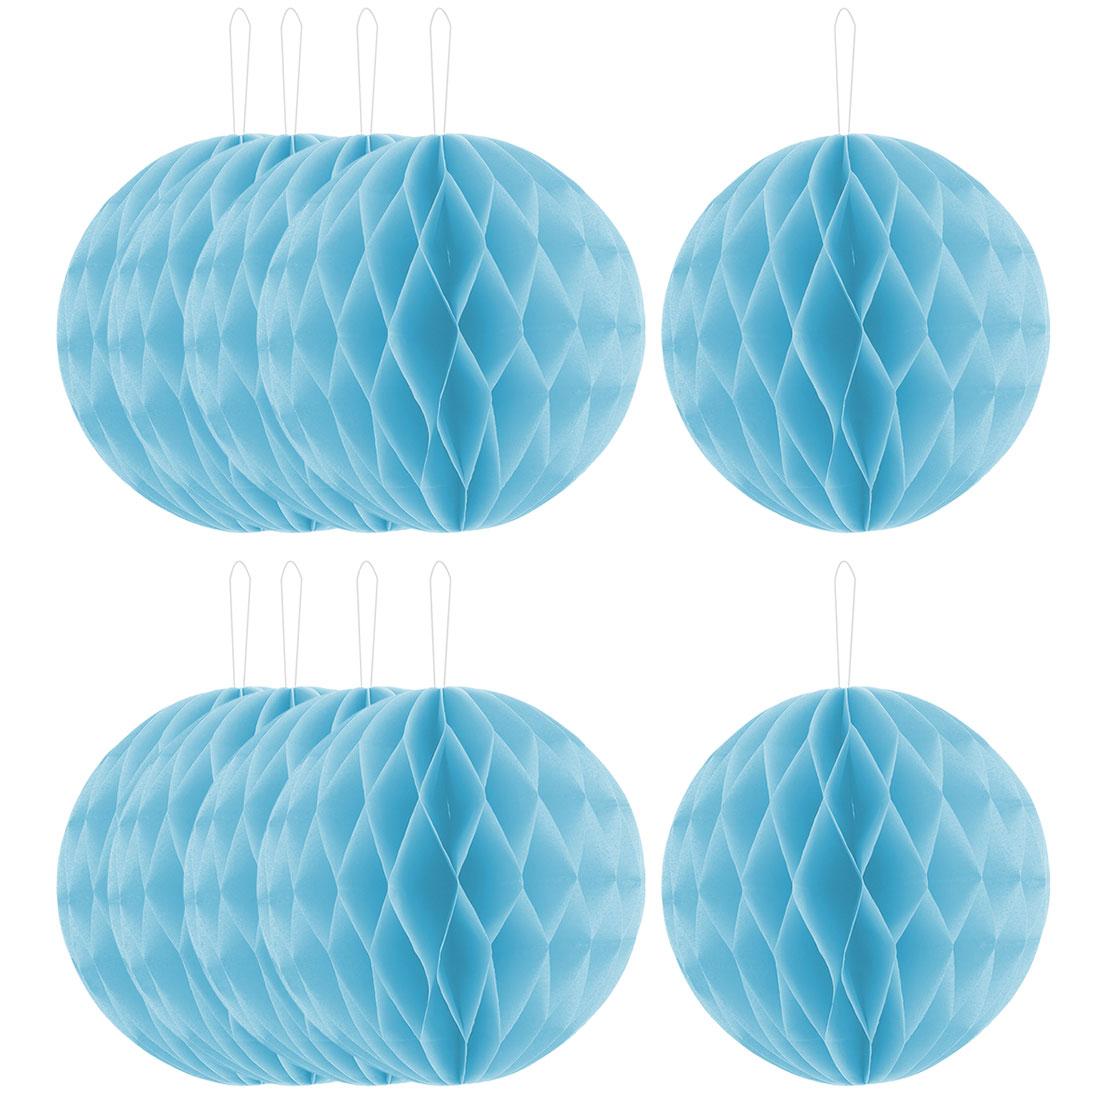 Festival Paper Handmade DIY Hanging Decor Honeycomb Ball Lantern Light Blue 8 Inches 10pcs